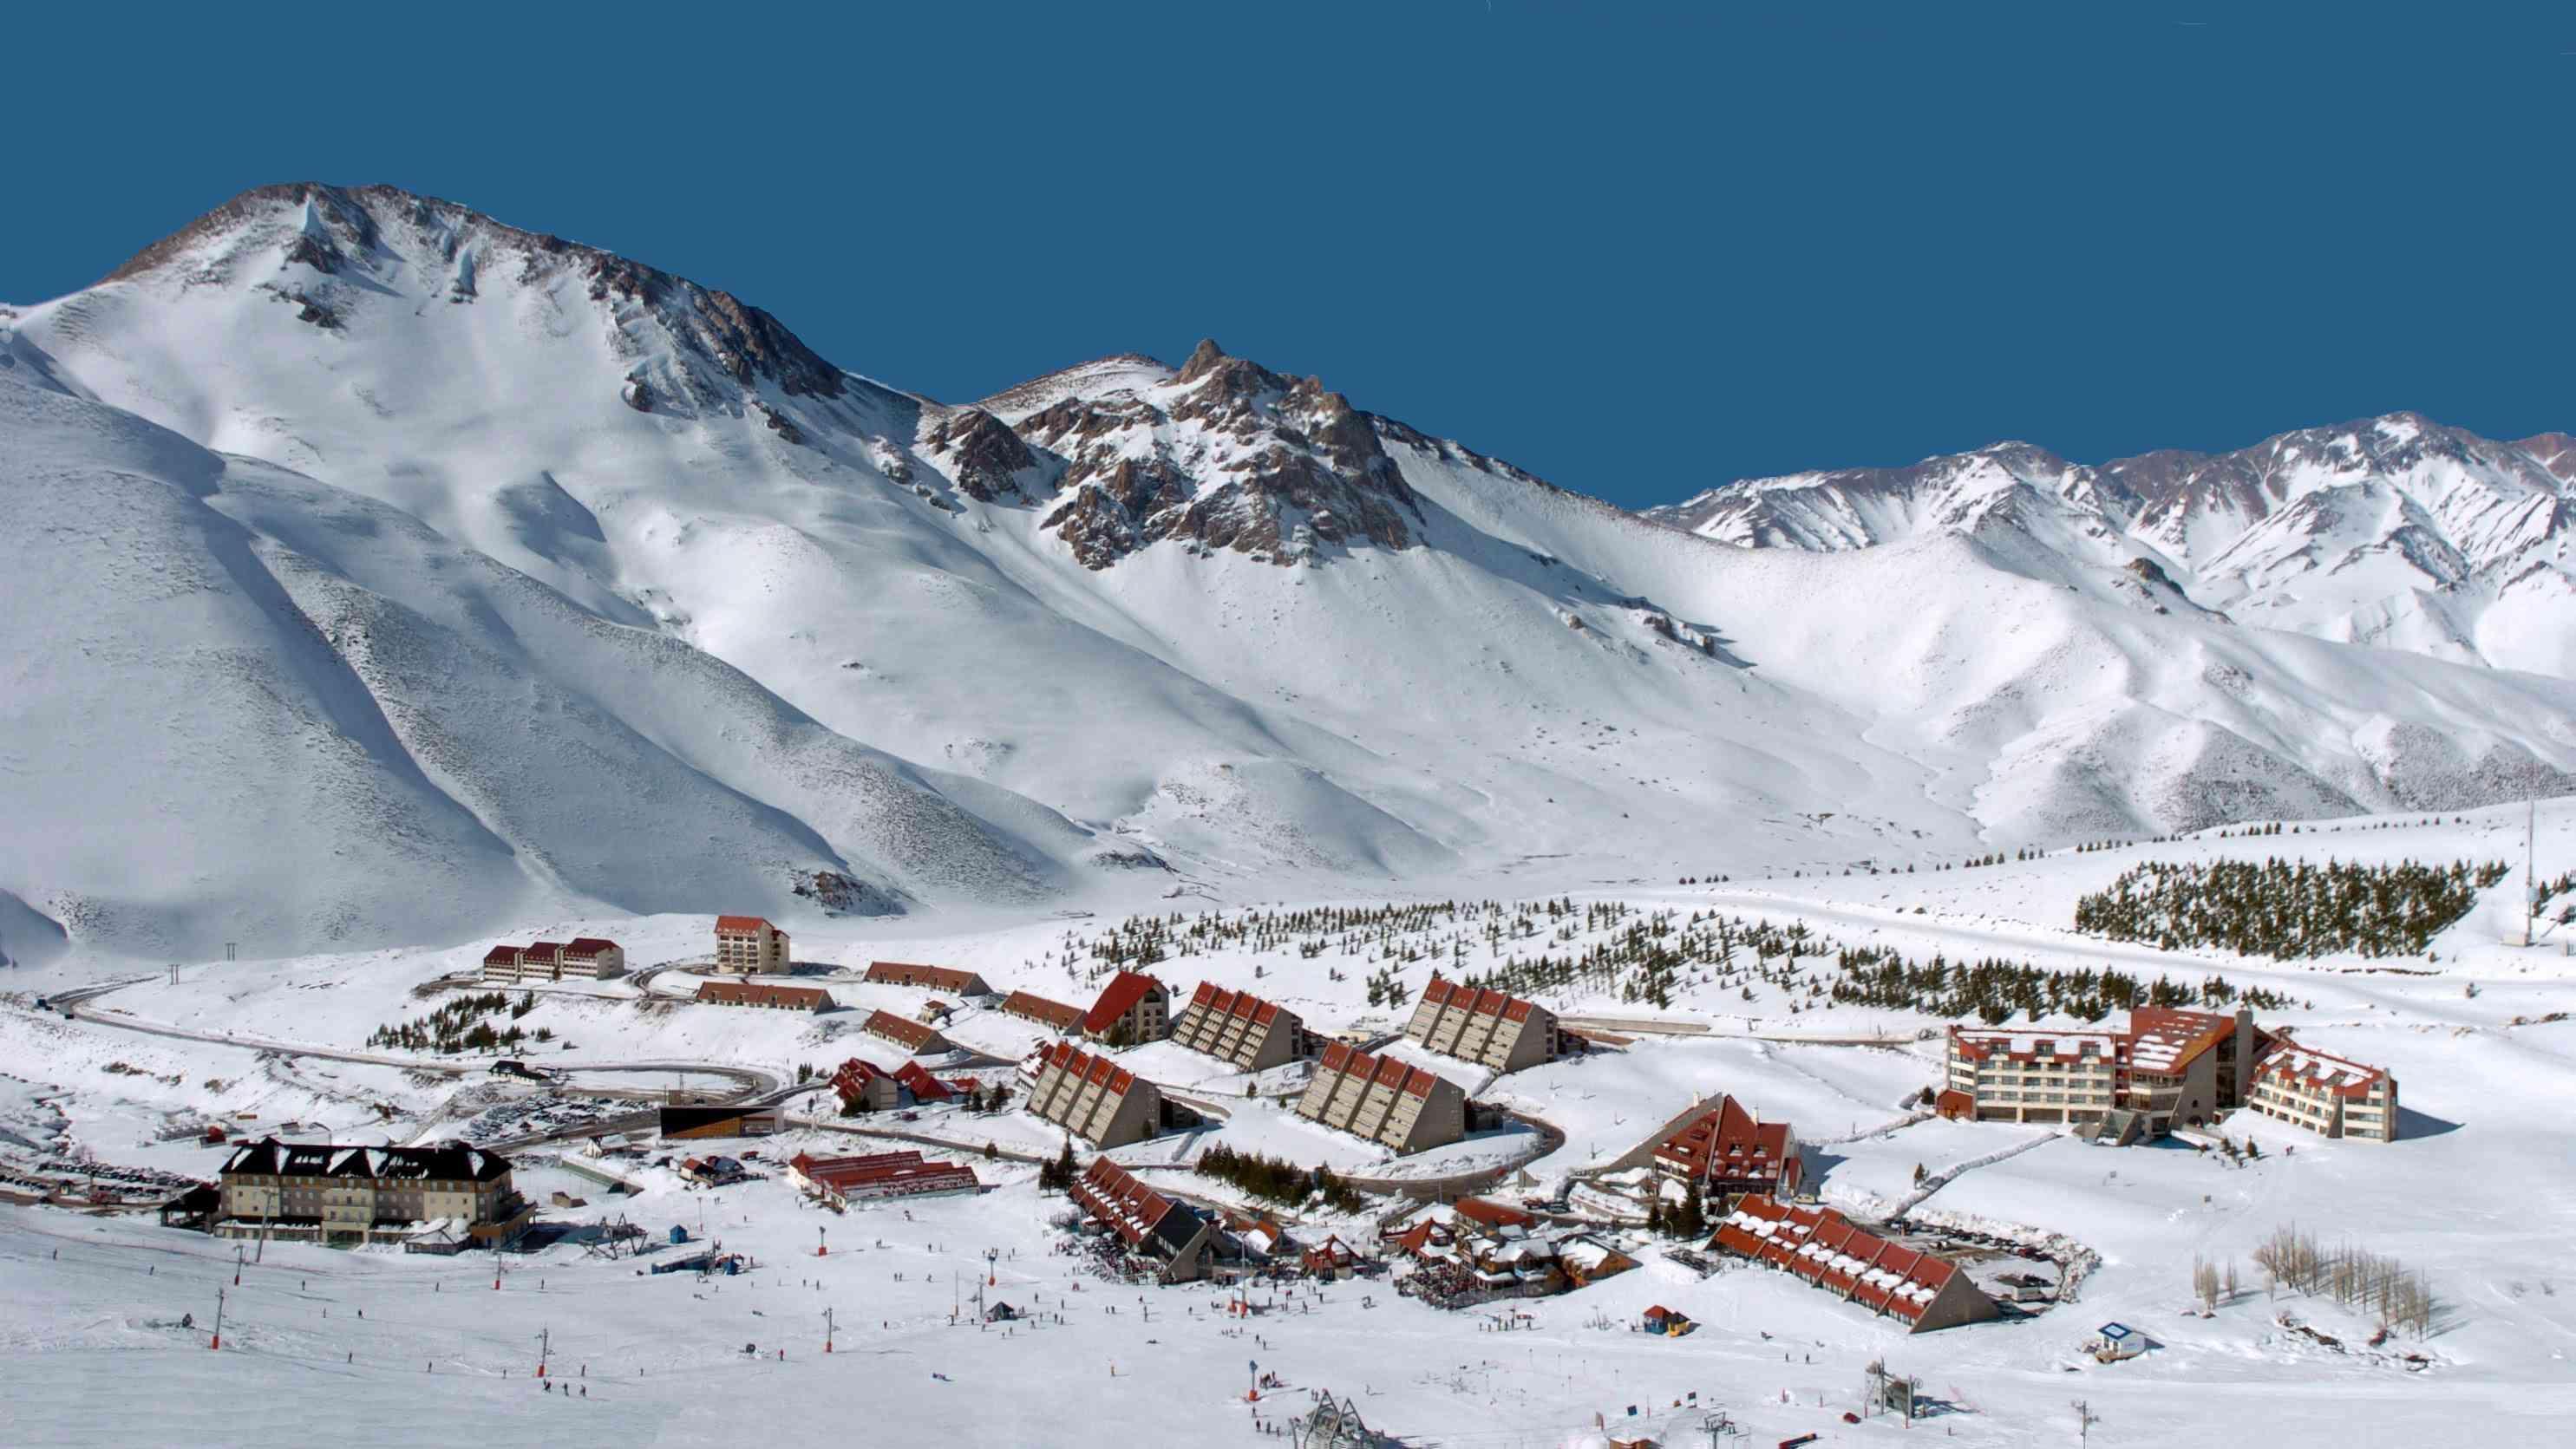 Centro de esquí Valle de Las Leñas